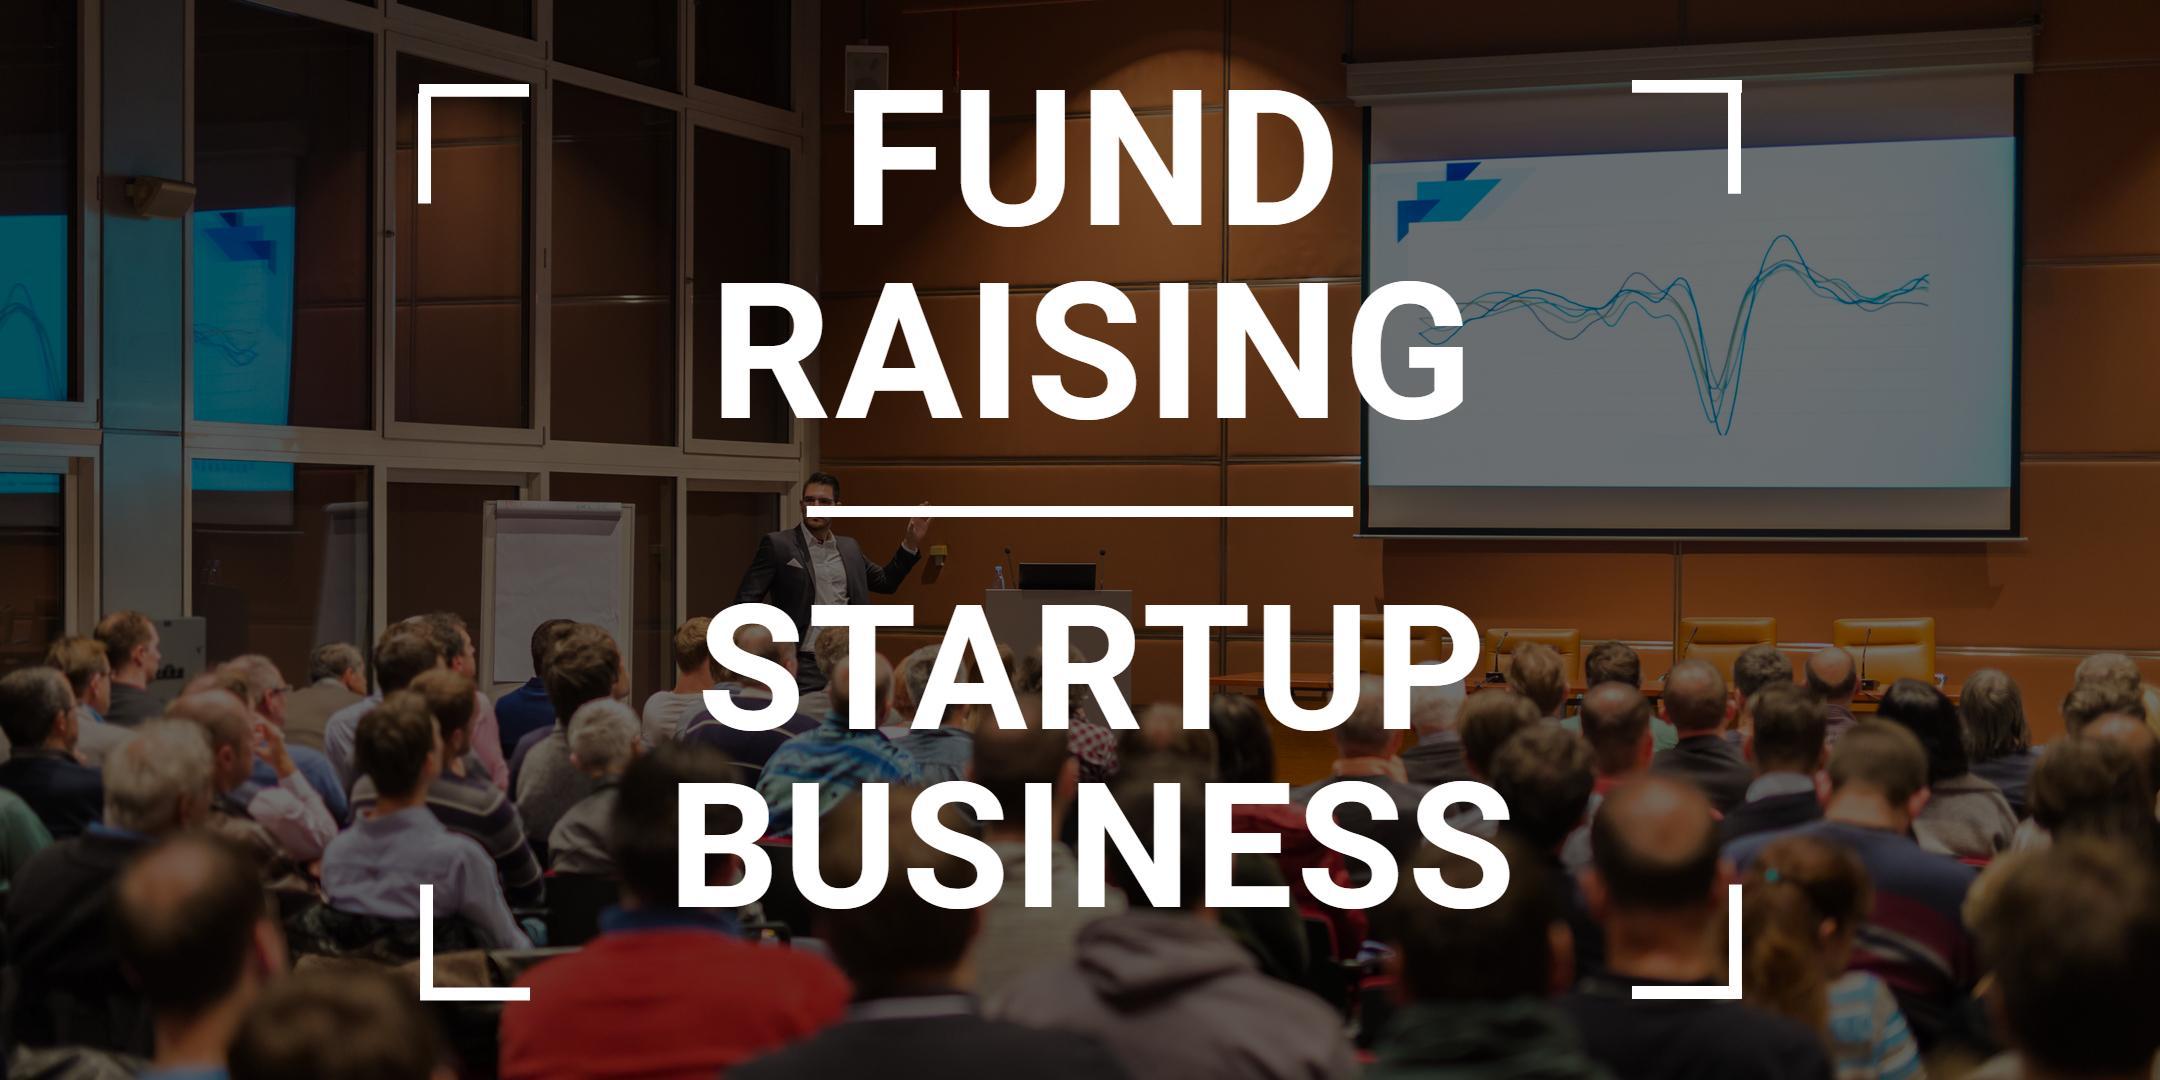 Fund Raising for Startups & Businesses